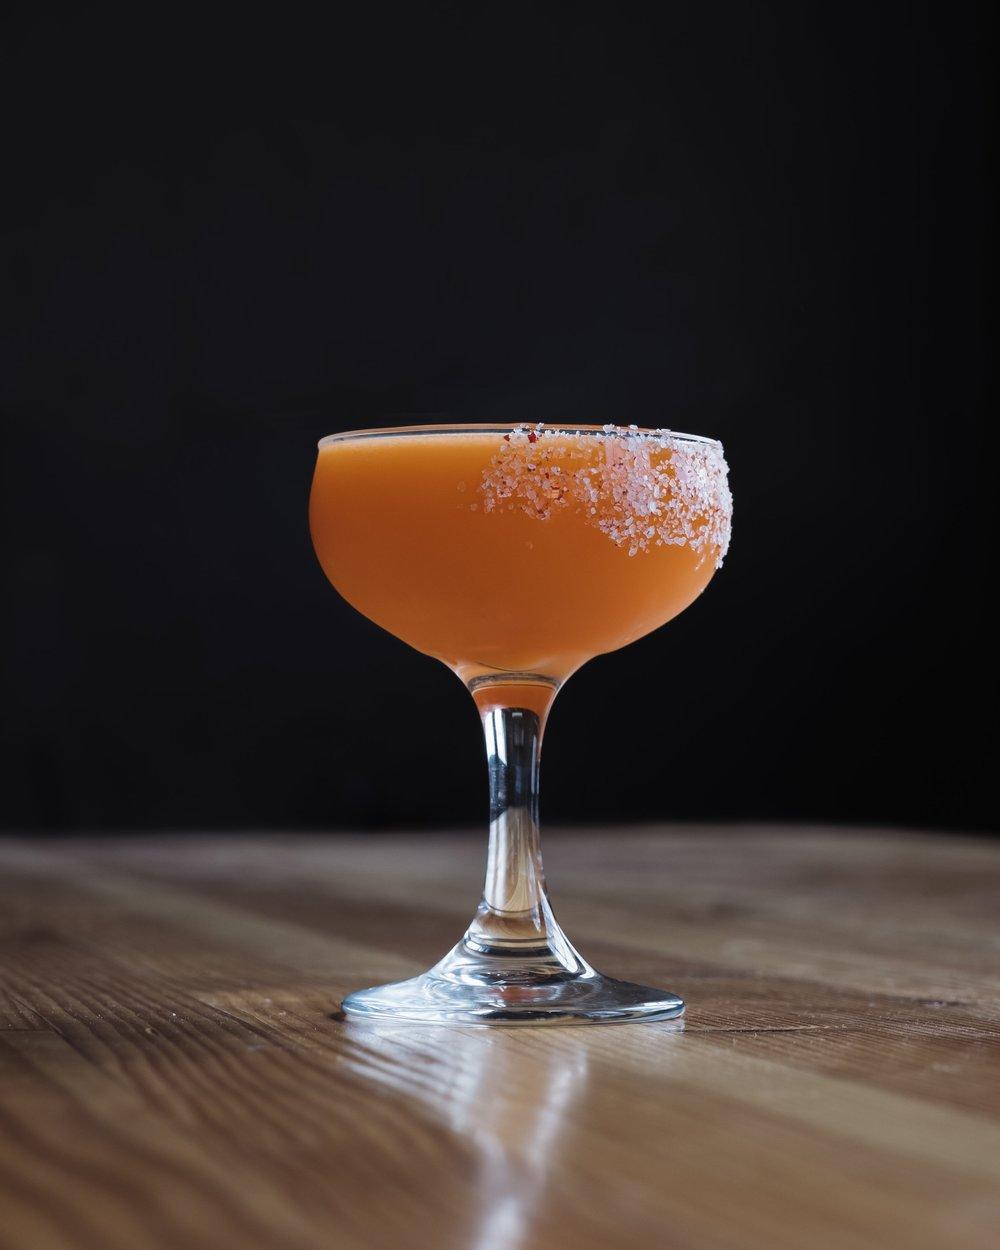 ingredients: - 1¾ oz Mezcal½ oz cinnamon syrup¾ oz fresh lime juice¾ oz fresh carrot juice2 dashes orange bitterssalt & pink peppercorns for rim